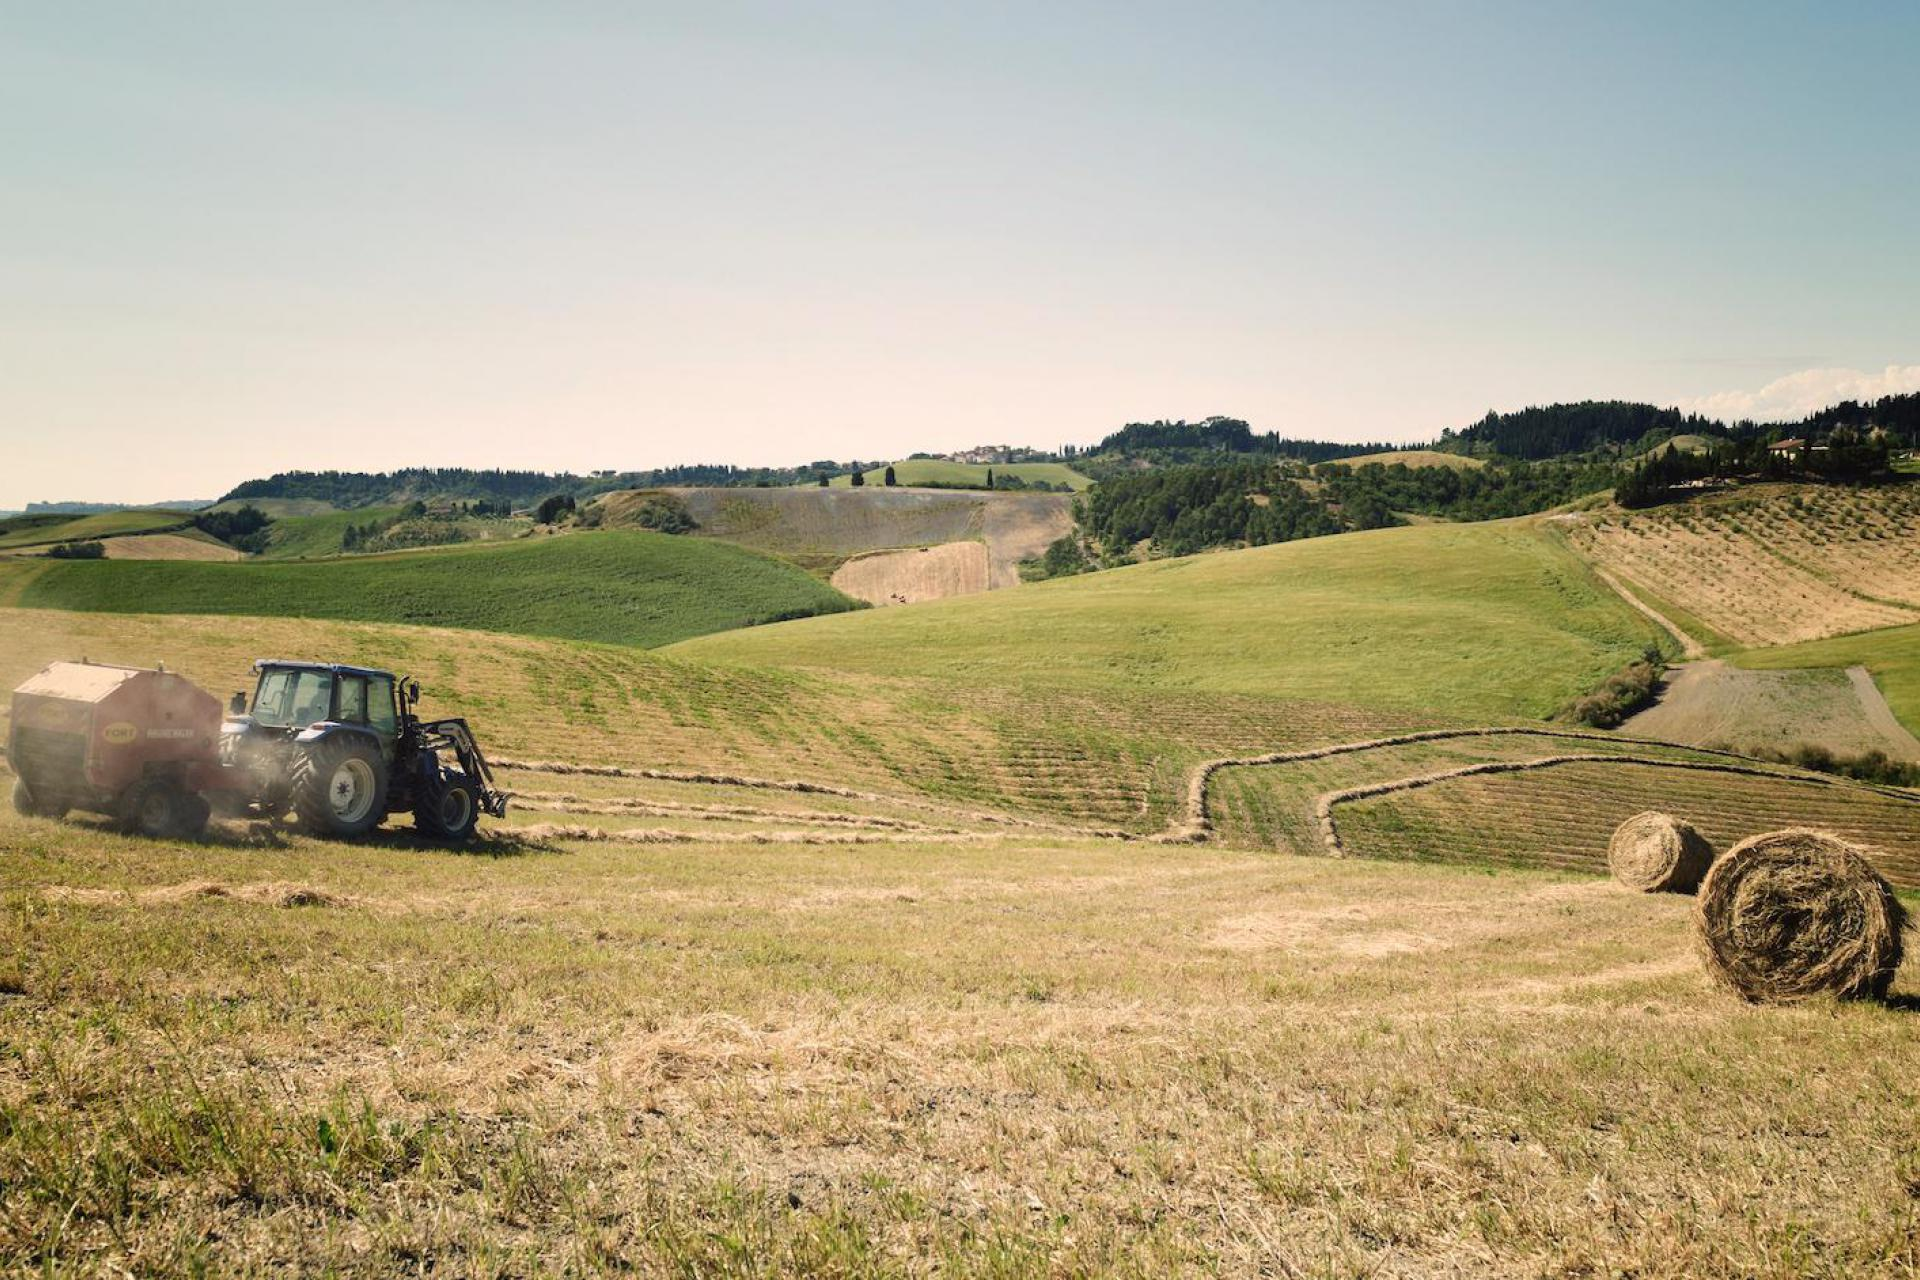 Agriturismo Toskana Klassischer Agriturismo - Landhaus in der Toskana   myitalyselection.de